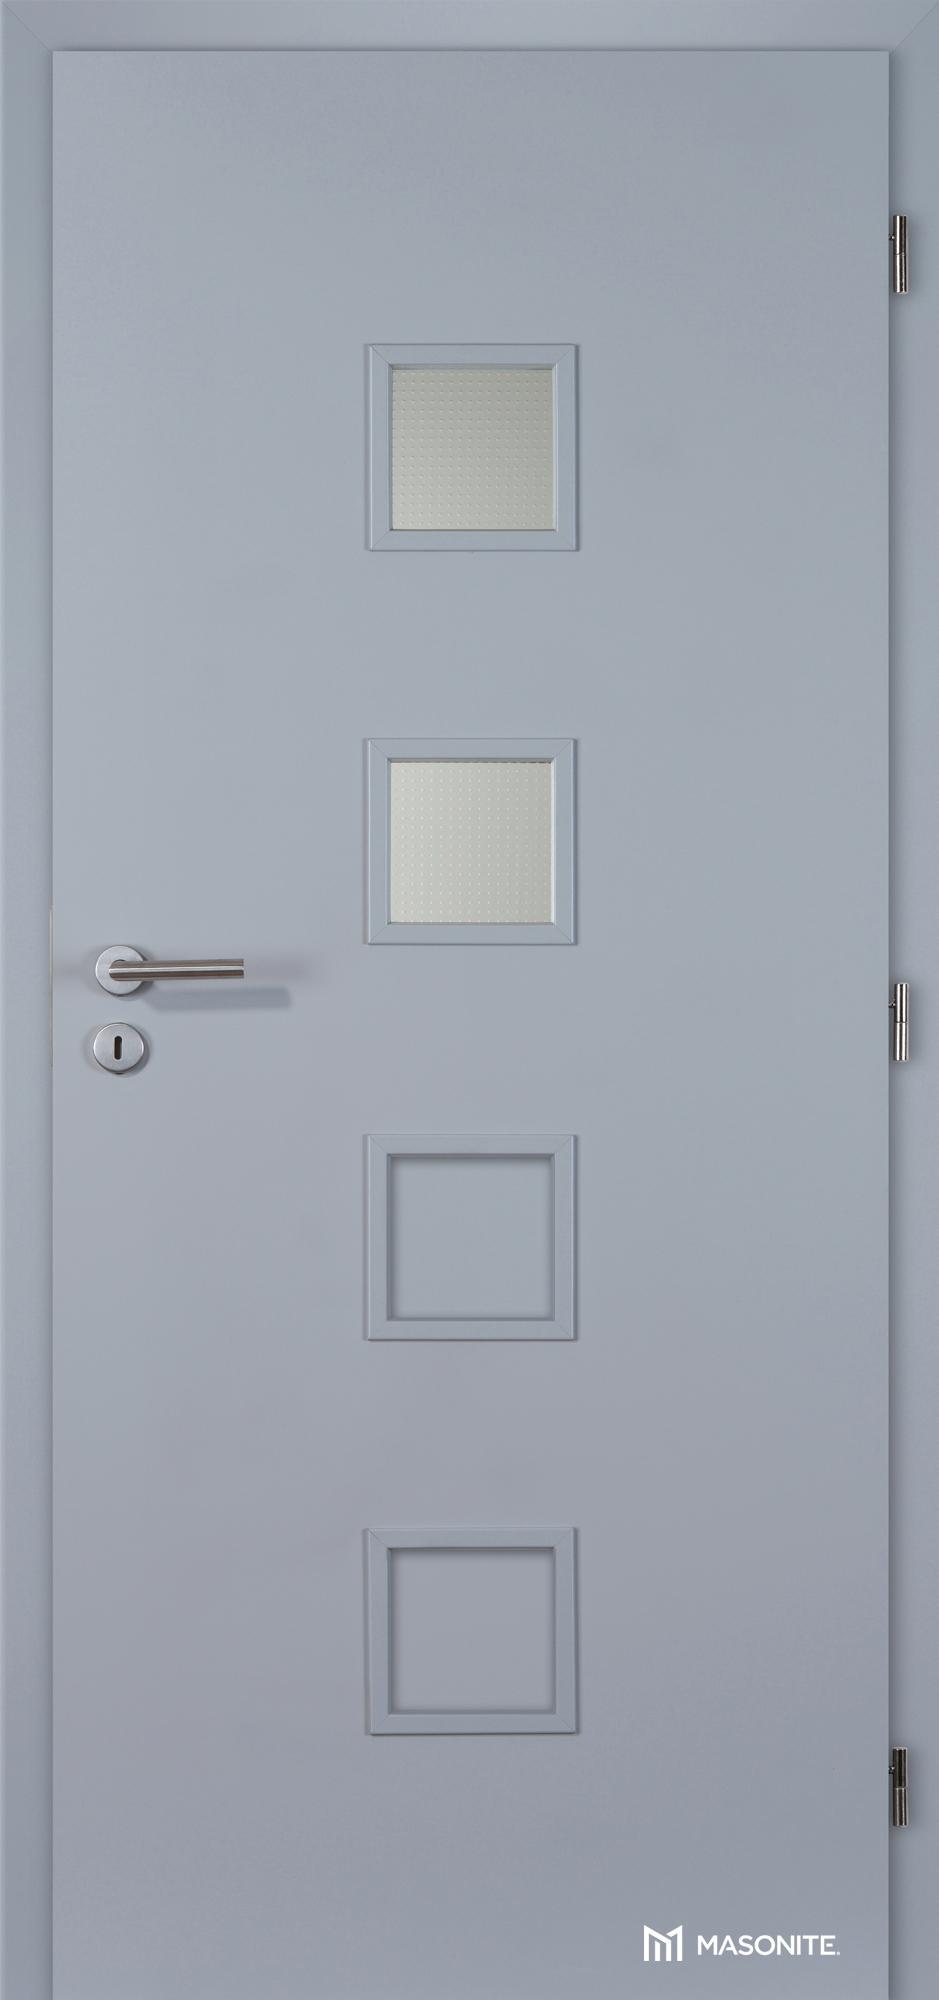 Interiérové dveře Masonite Quadra 2